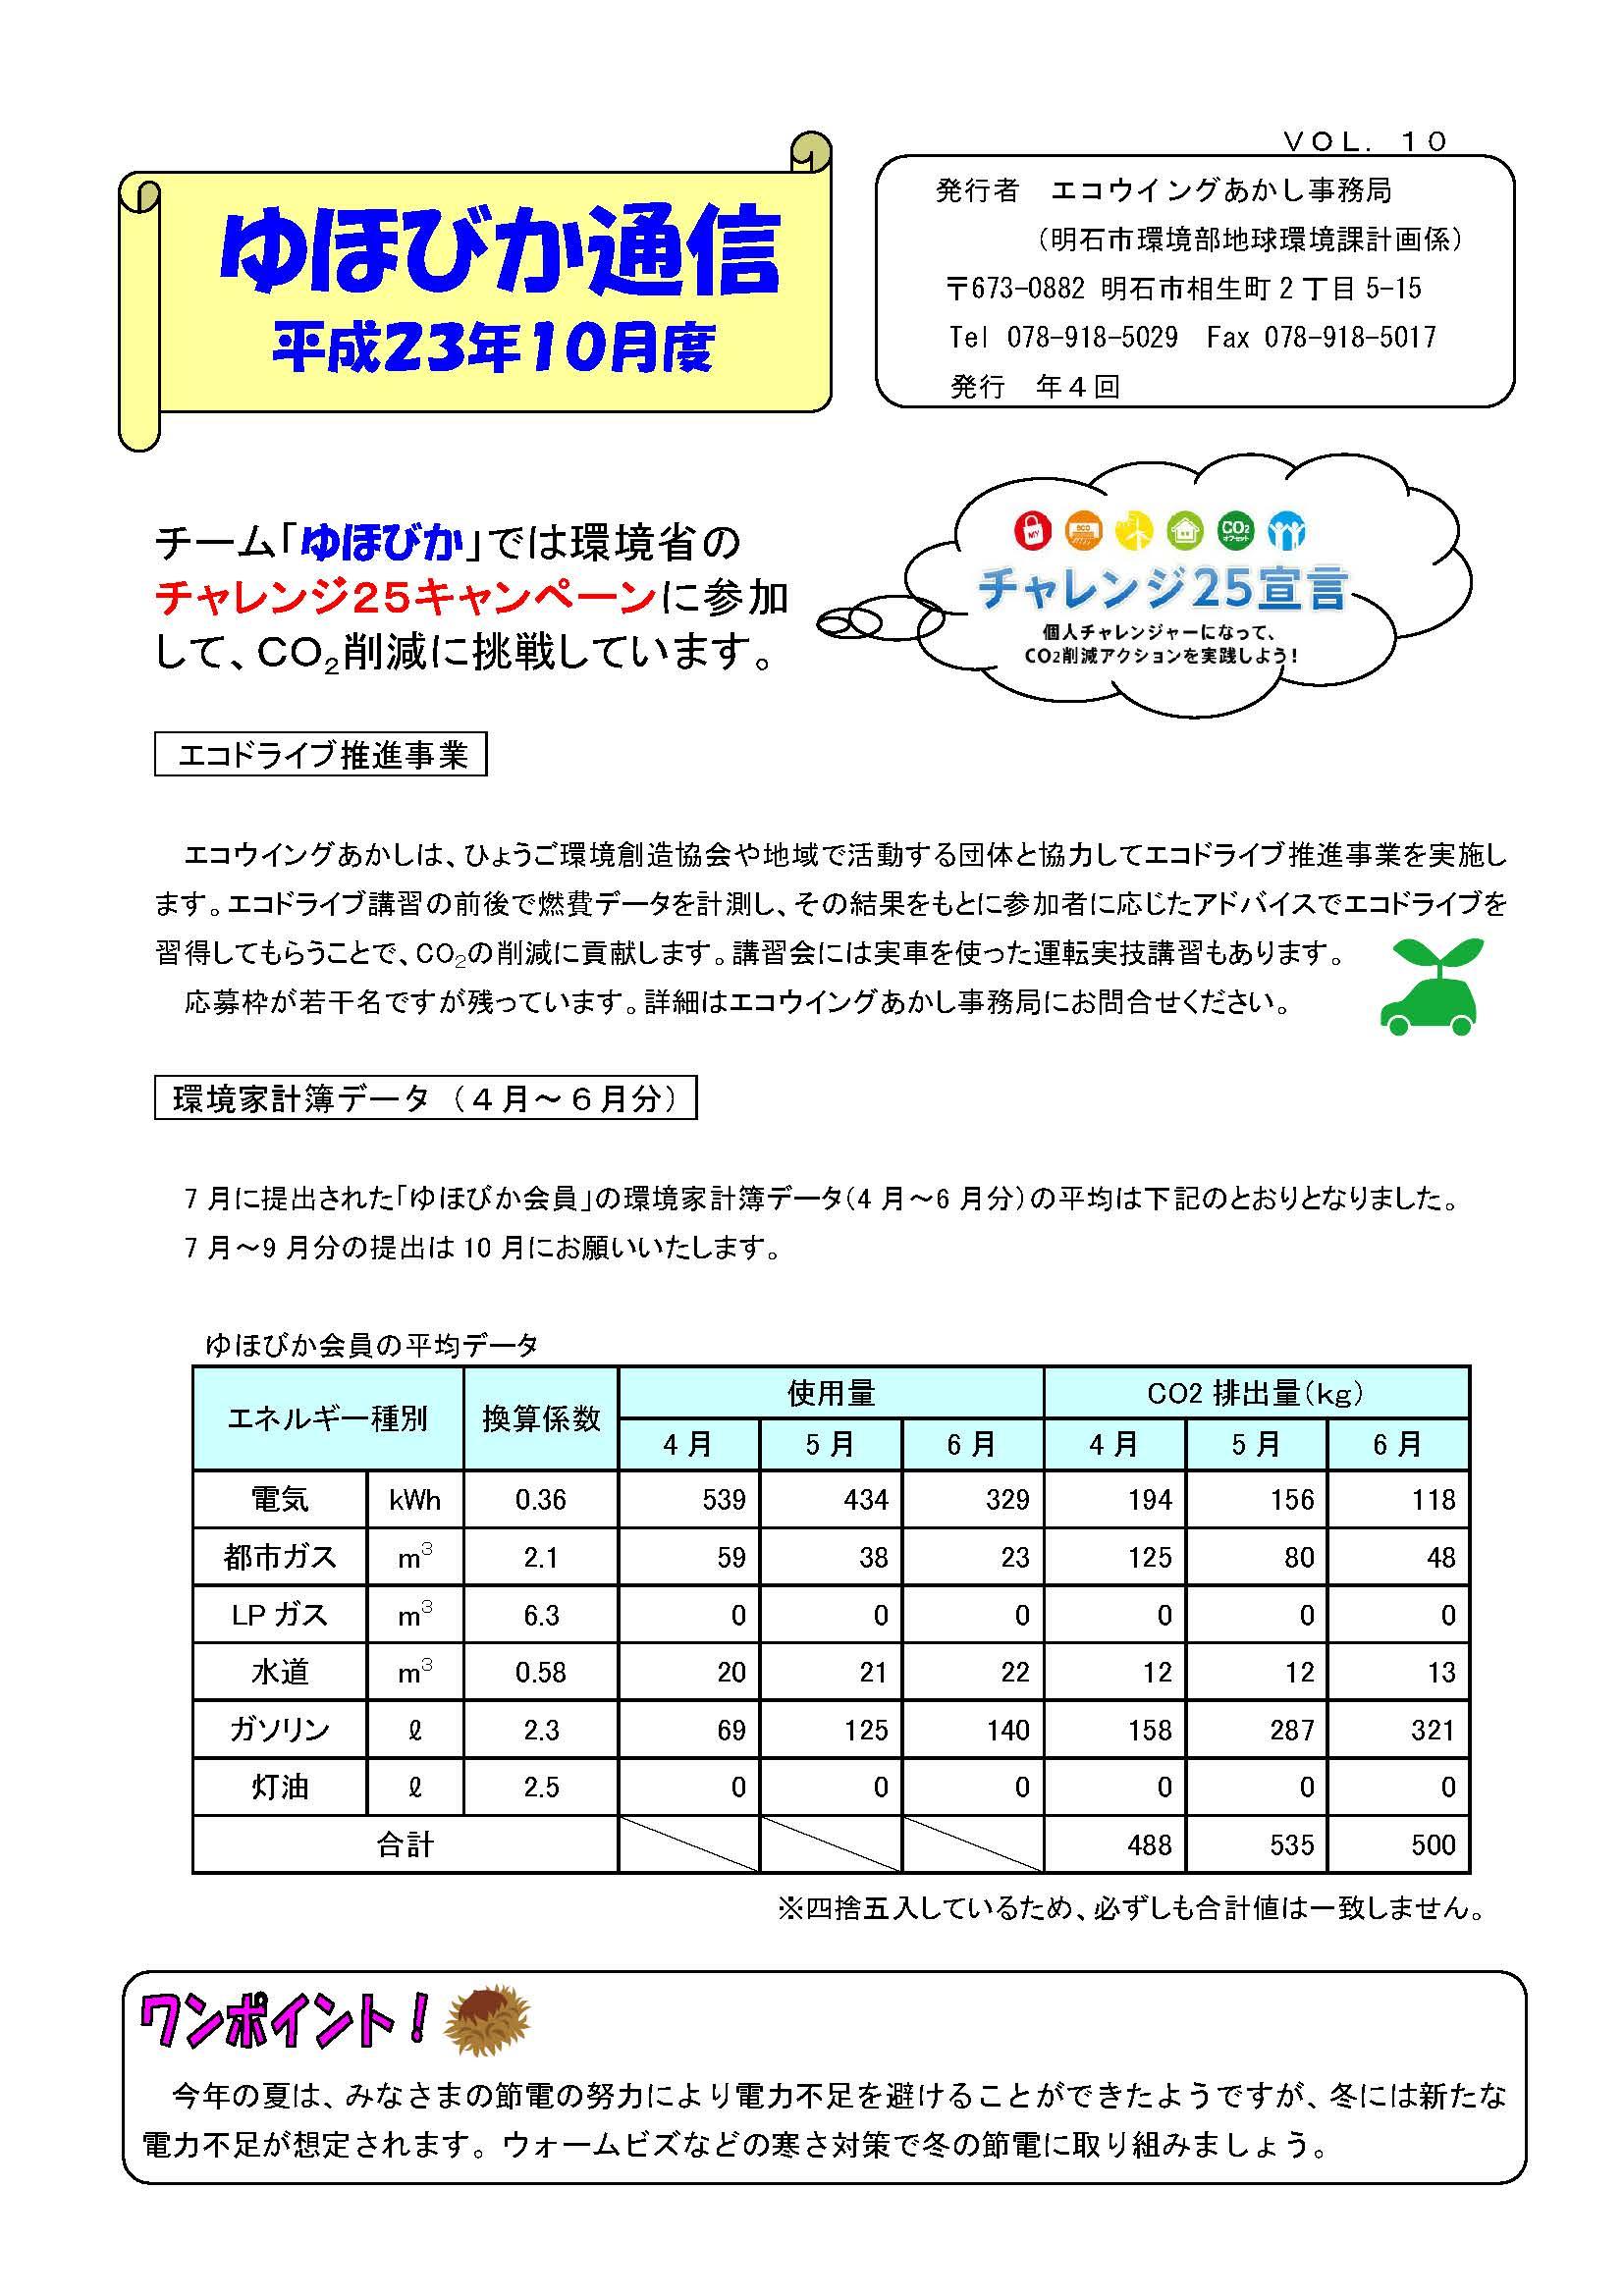 20111111_img_01.jpg